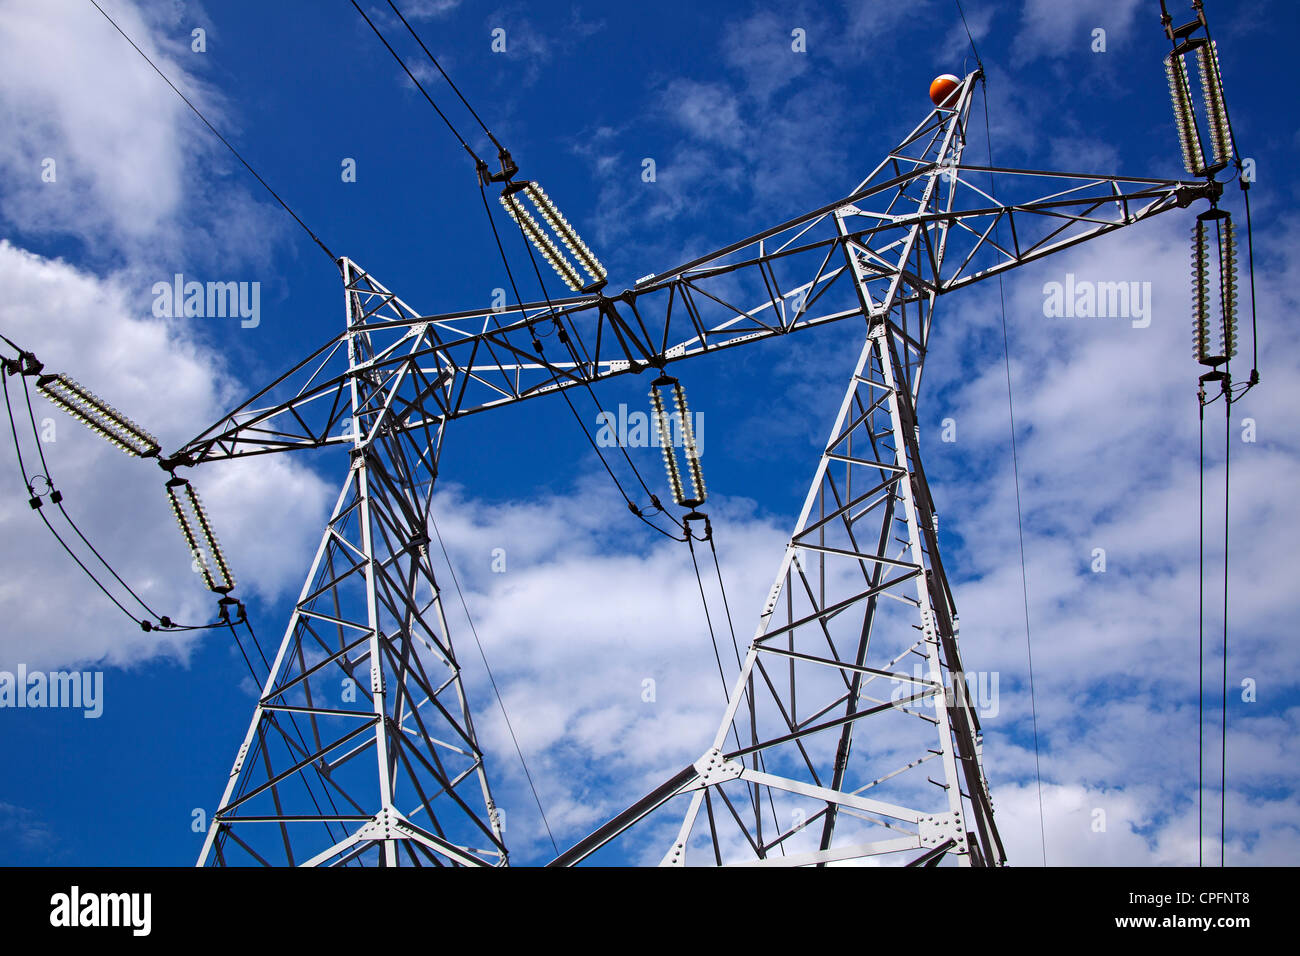 Hohe Spannung elektrische Leitung Stockbild